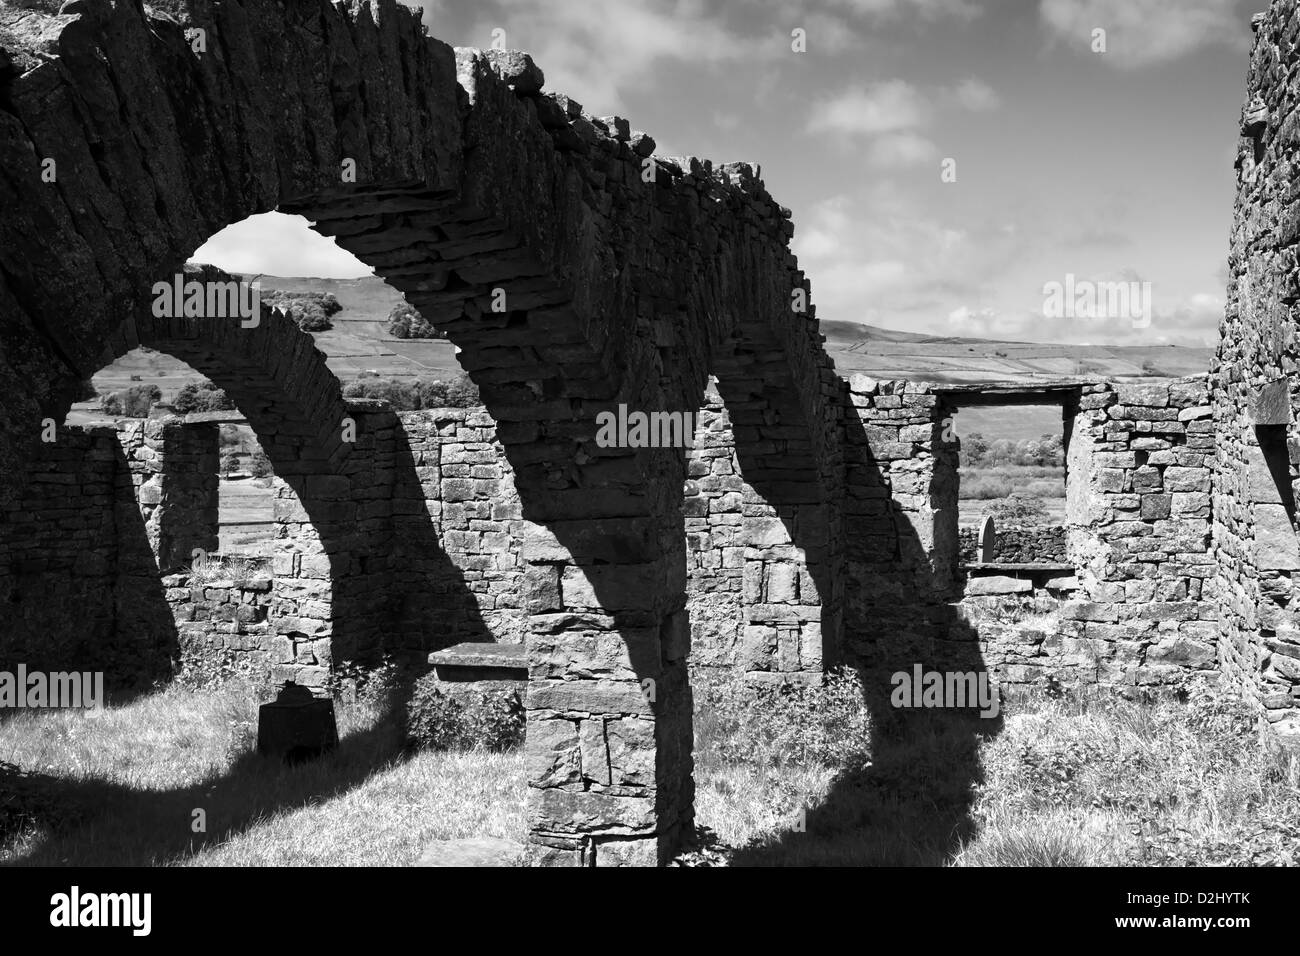 Il robusto rovina di spegnimento Busk vecchia chiesa, Raydale, Yorkshire Dales National Park, Inghilterra Foto Stock